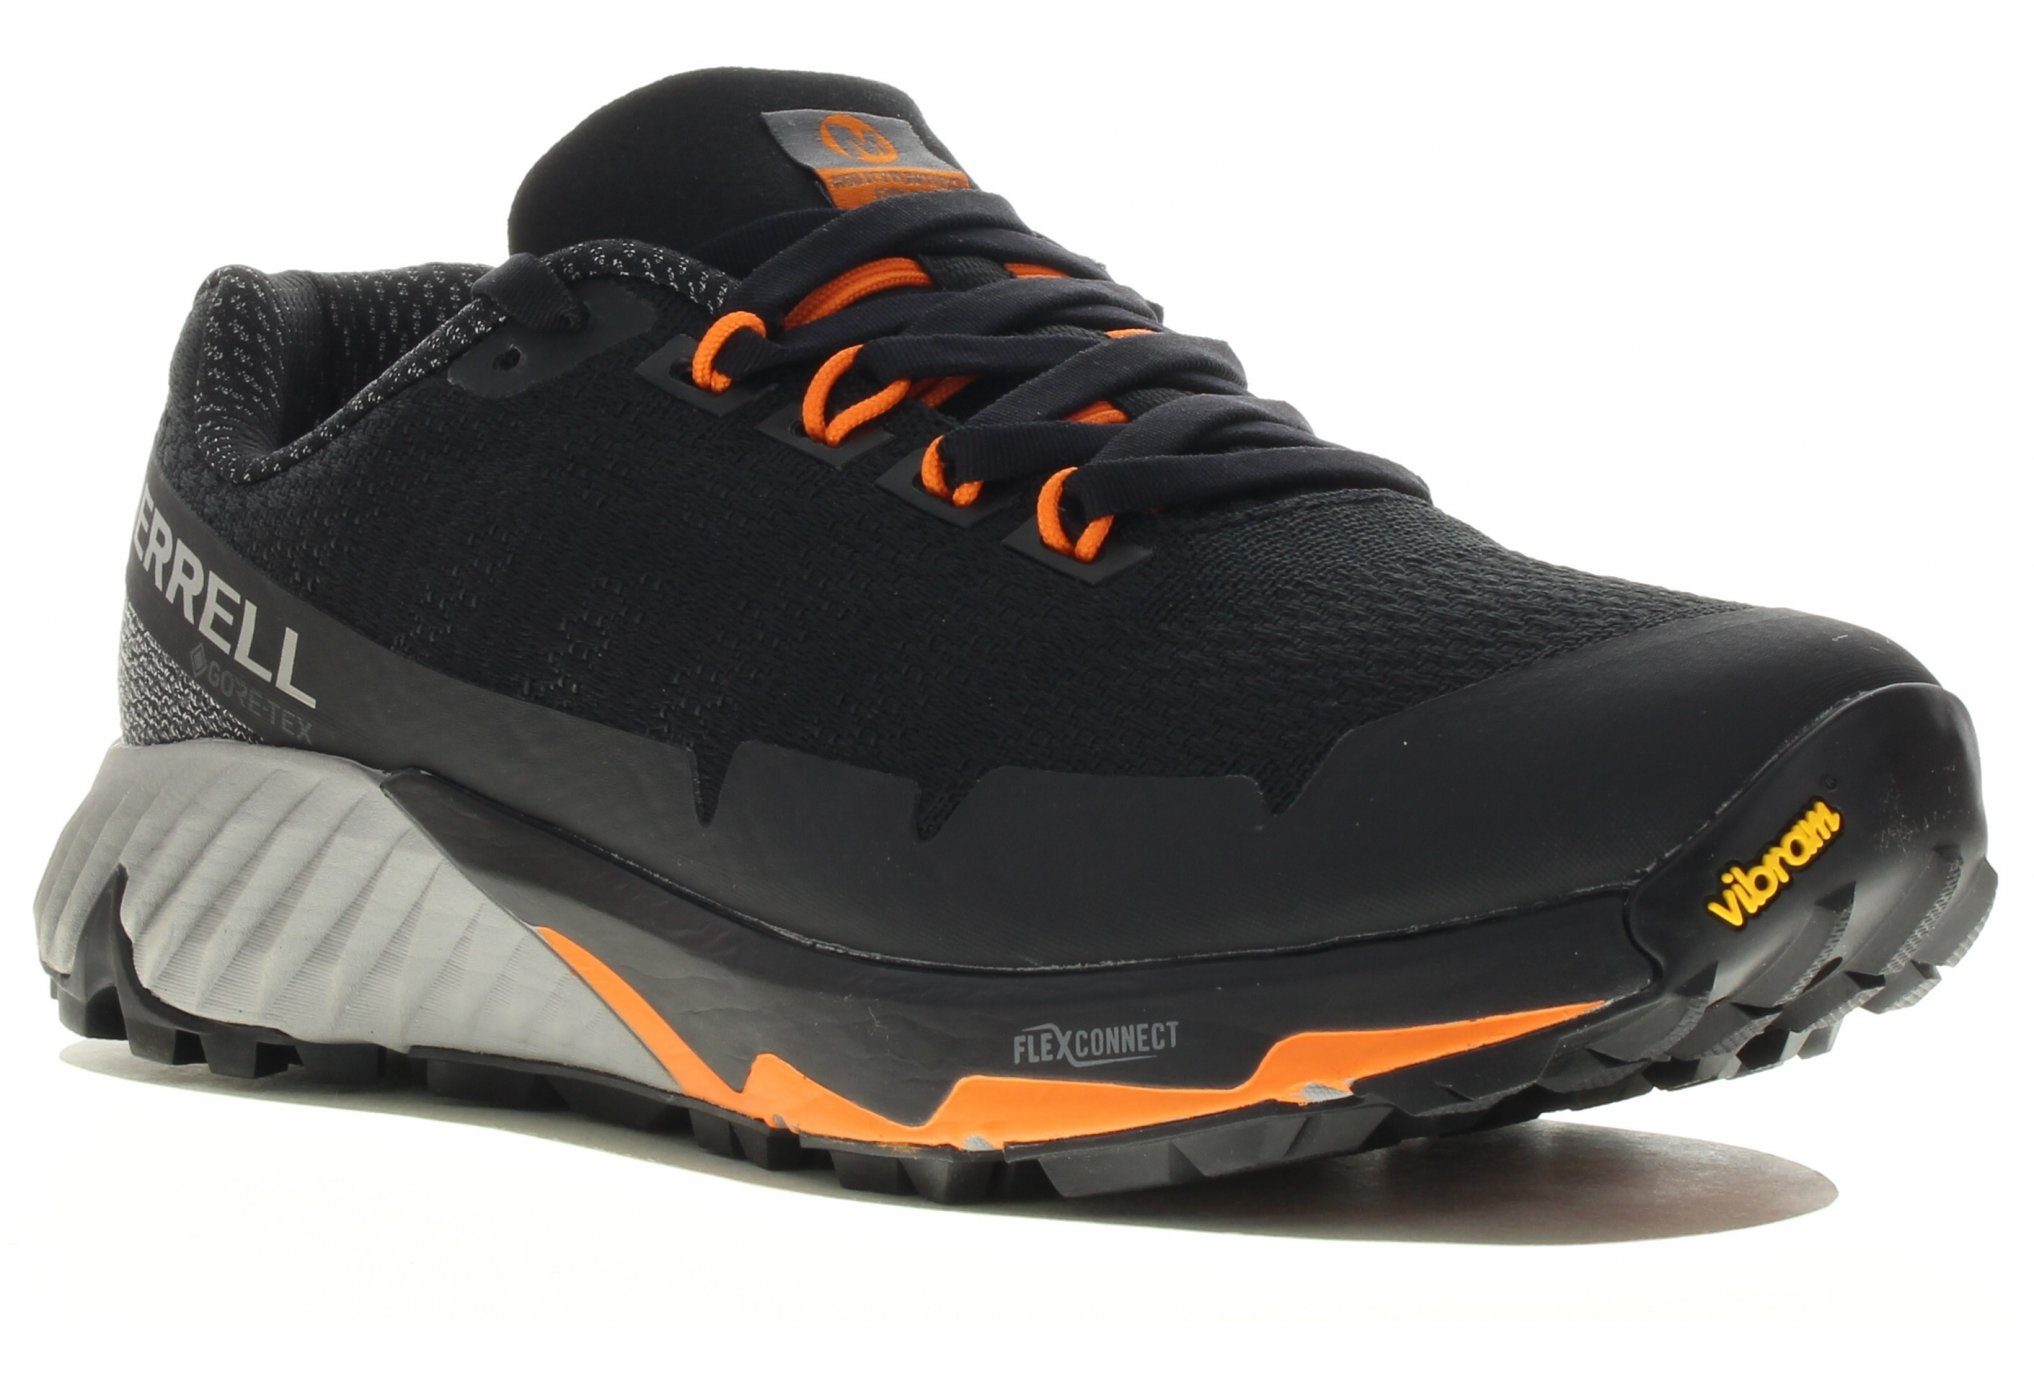 Merrell Agility Peak Flex 3 Gore-Tex Chaussures homme